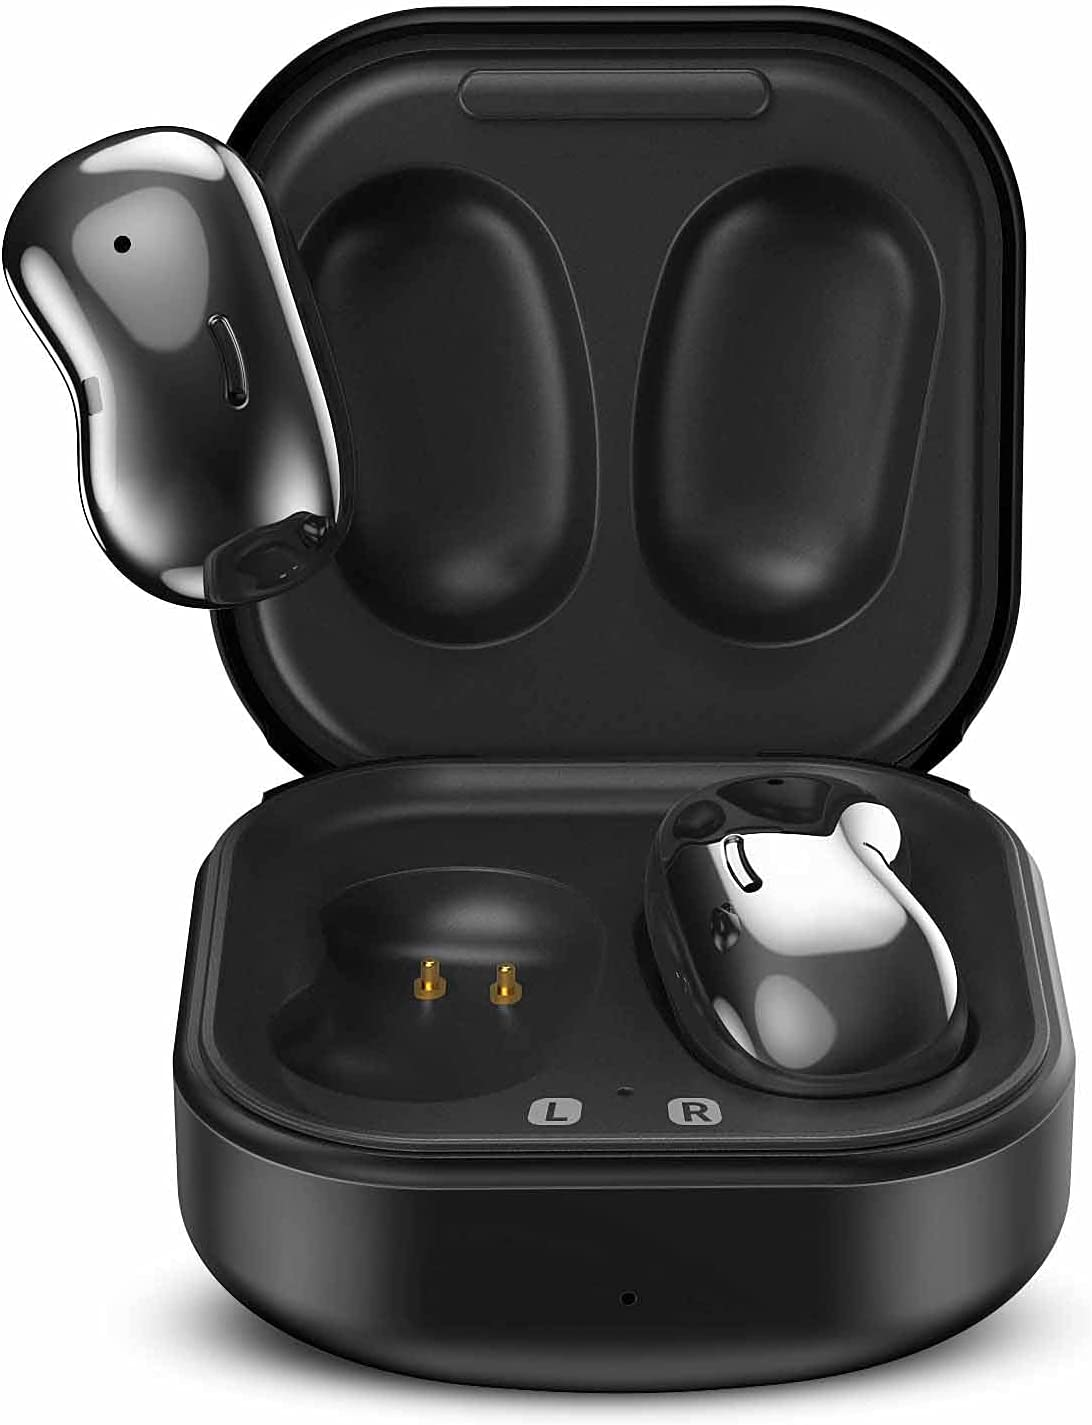 Urbanx Bombing new work Street Buds Live Max 62% OFF True Headphones very Earbud Wireless for